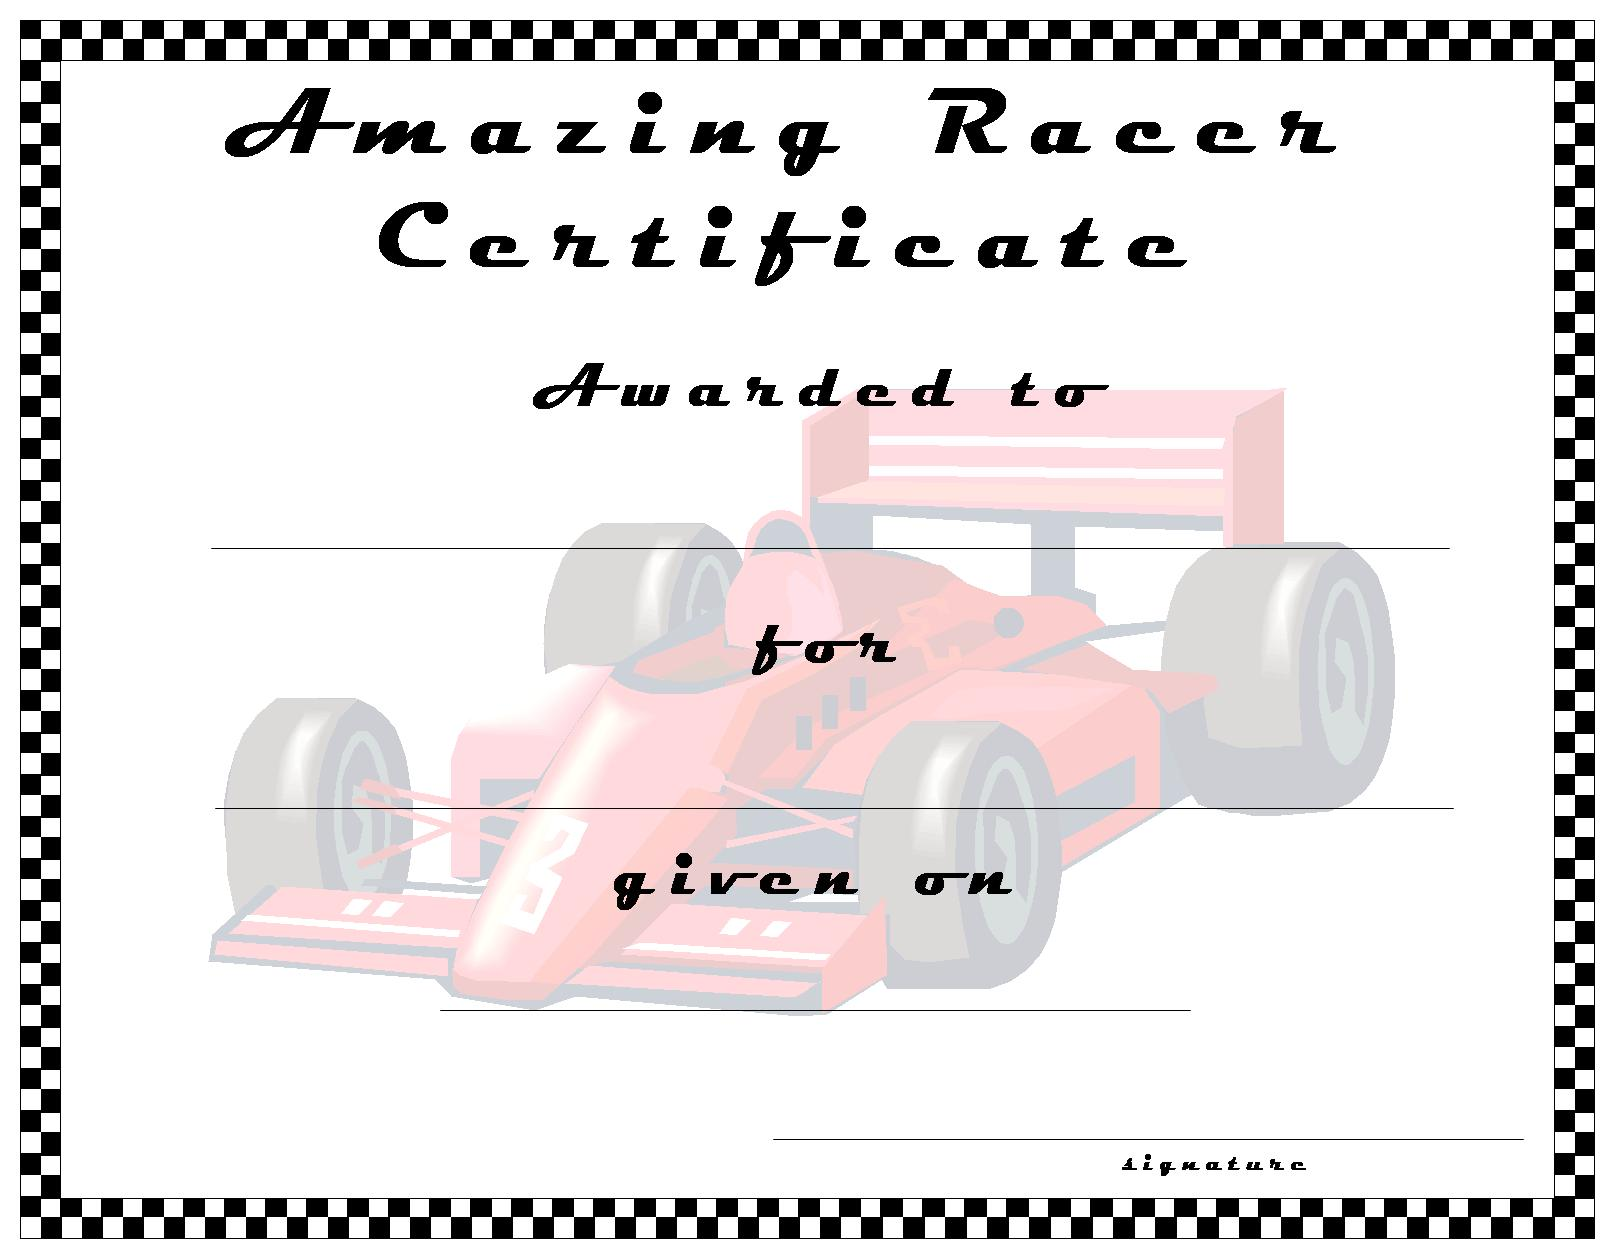 Car show award certificate template choice image certificate car show certificate template choice image certificate design car show award certificate template choice image certificate alramifo Choice Image